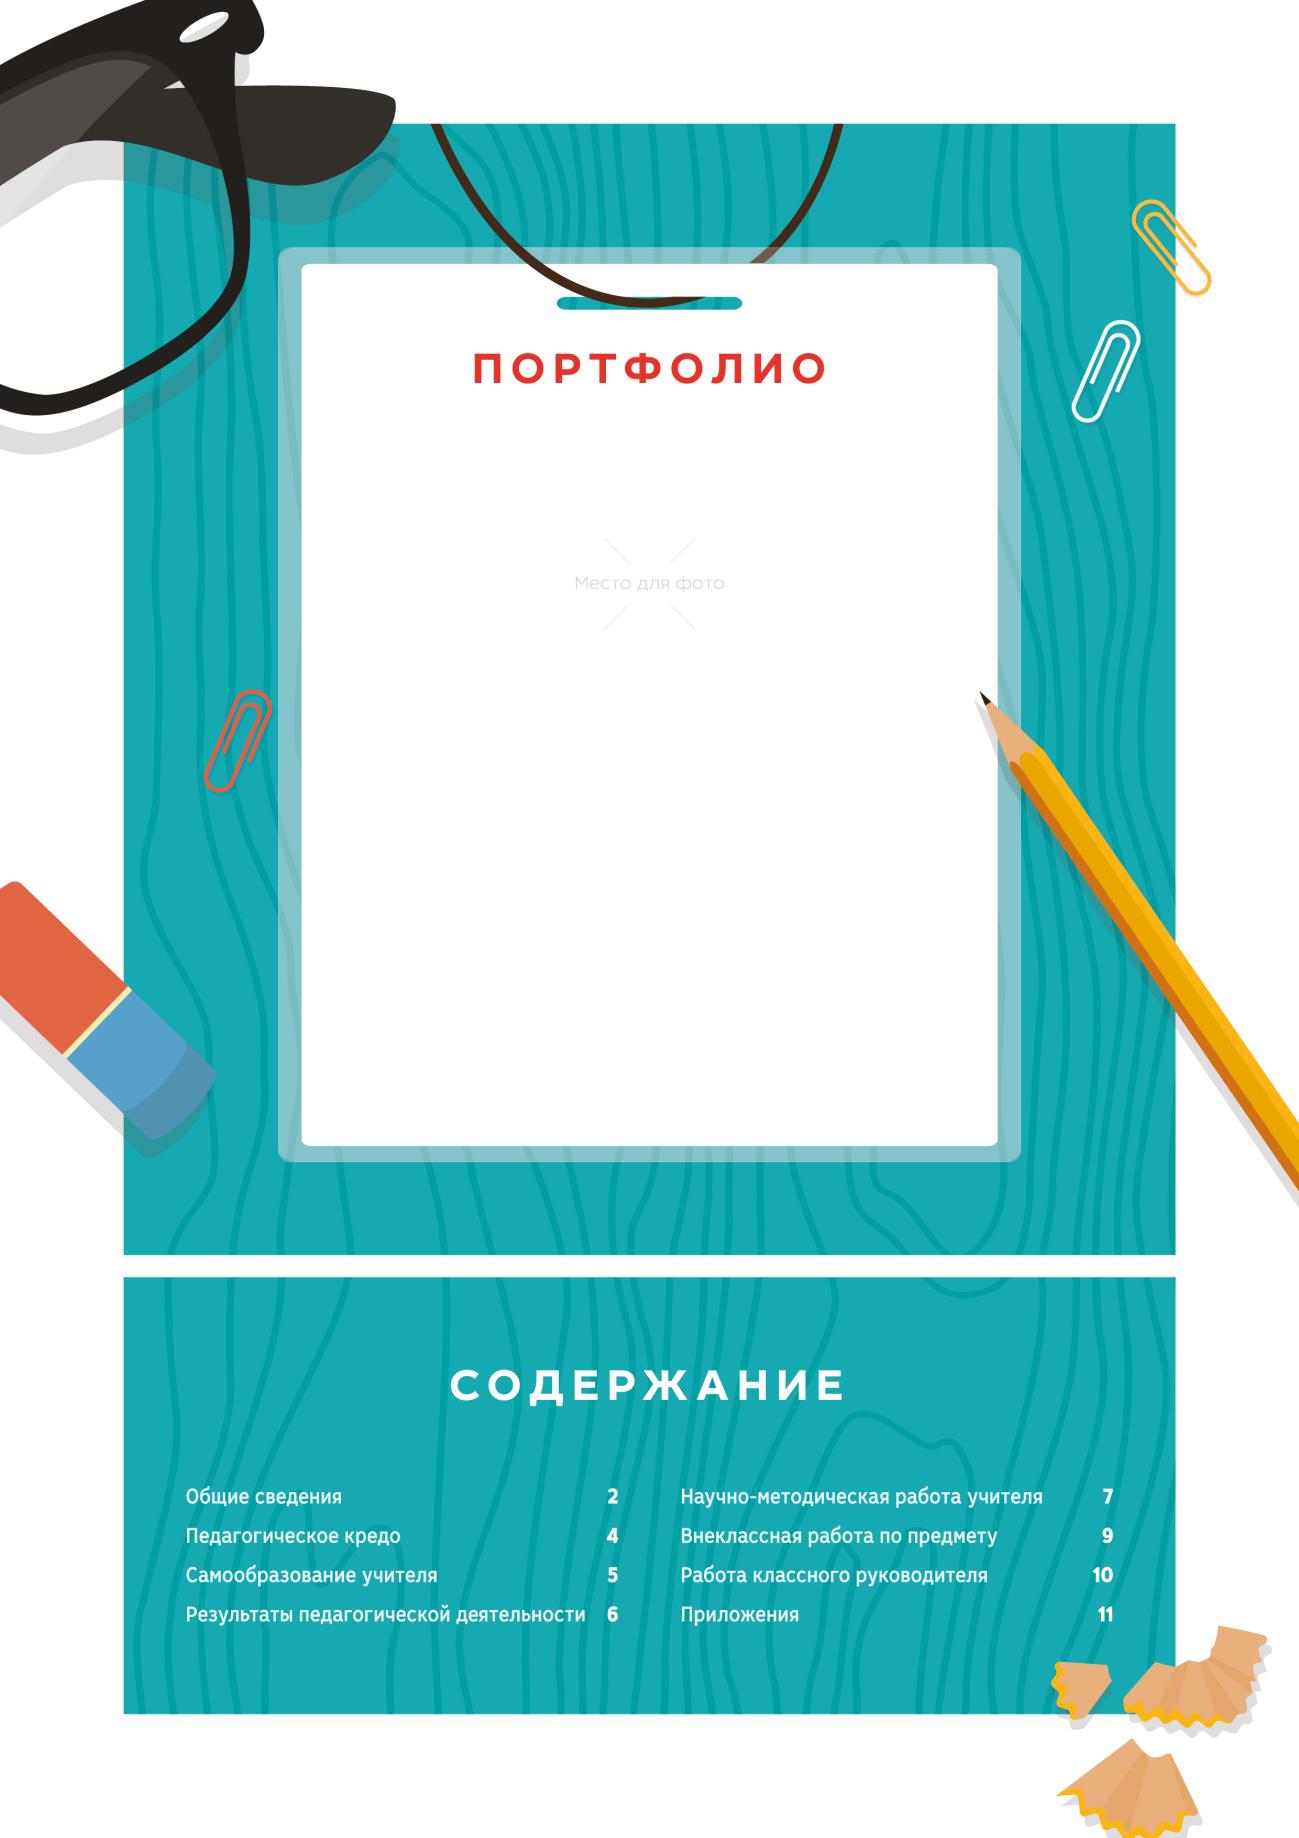 D:\projects\Александр\Олимпиады\Май2015\Портфель учителя\!send\my_portfolio1_2.png